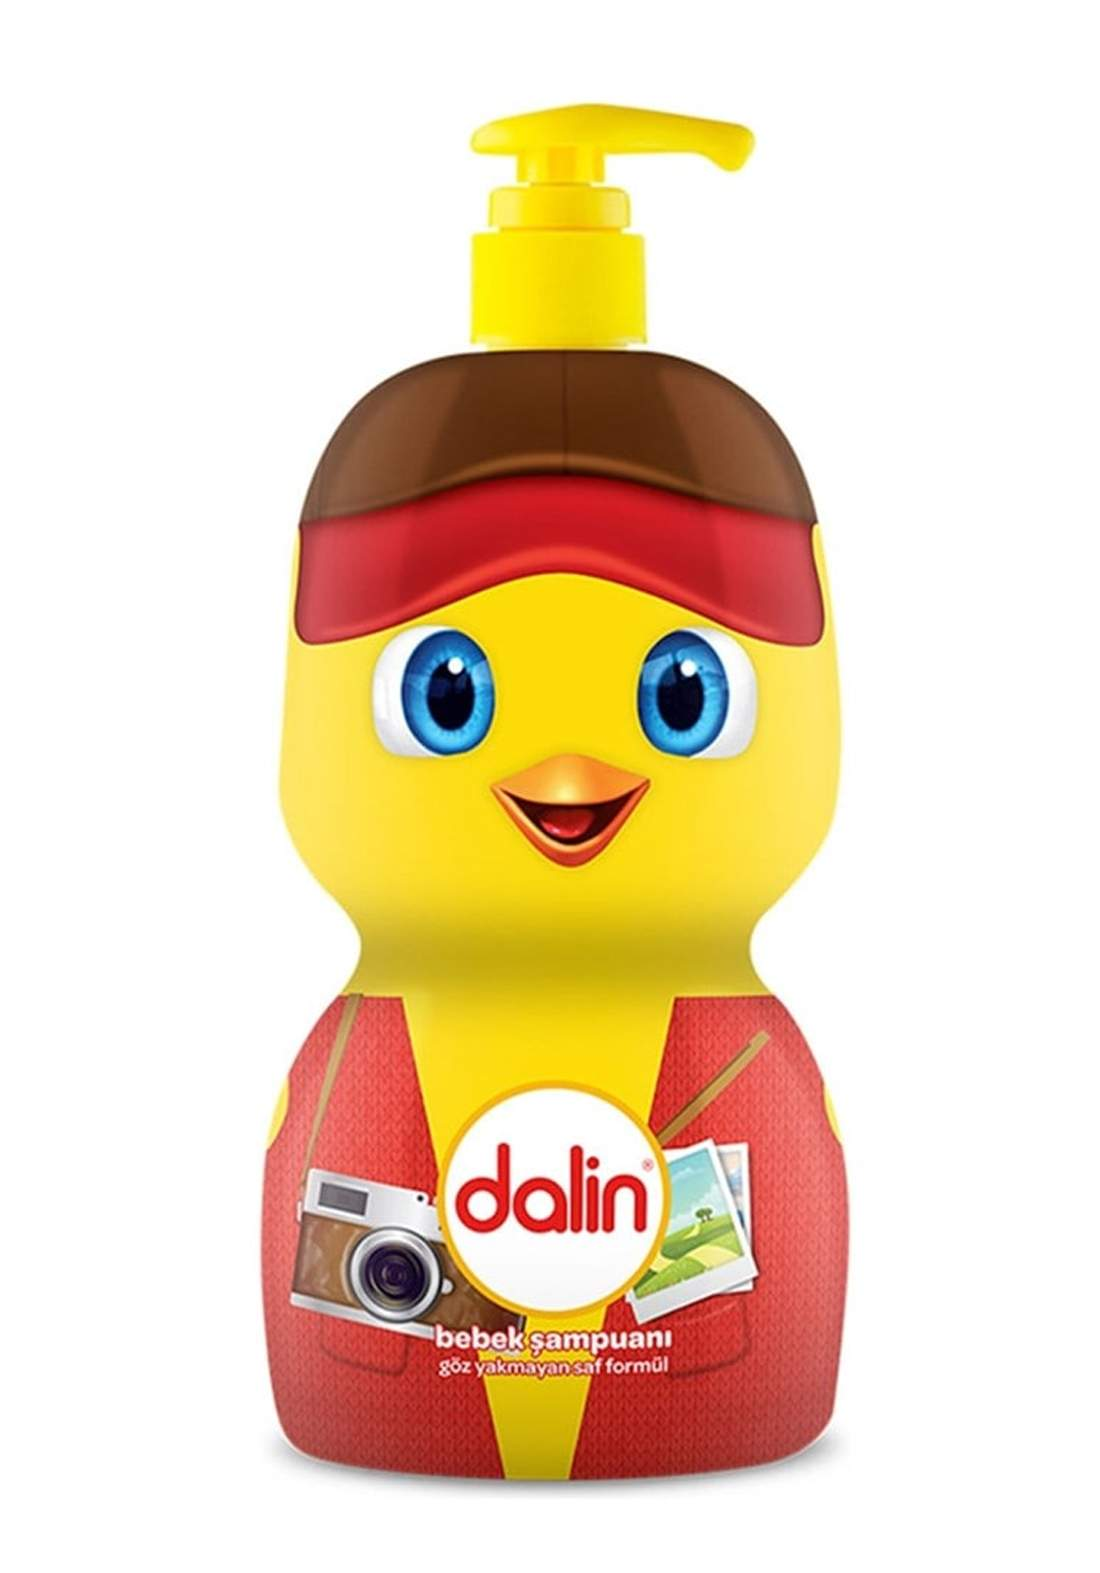 Dalin Chick Bottle Baby Shampoo 650 ml شامبو أطفال